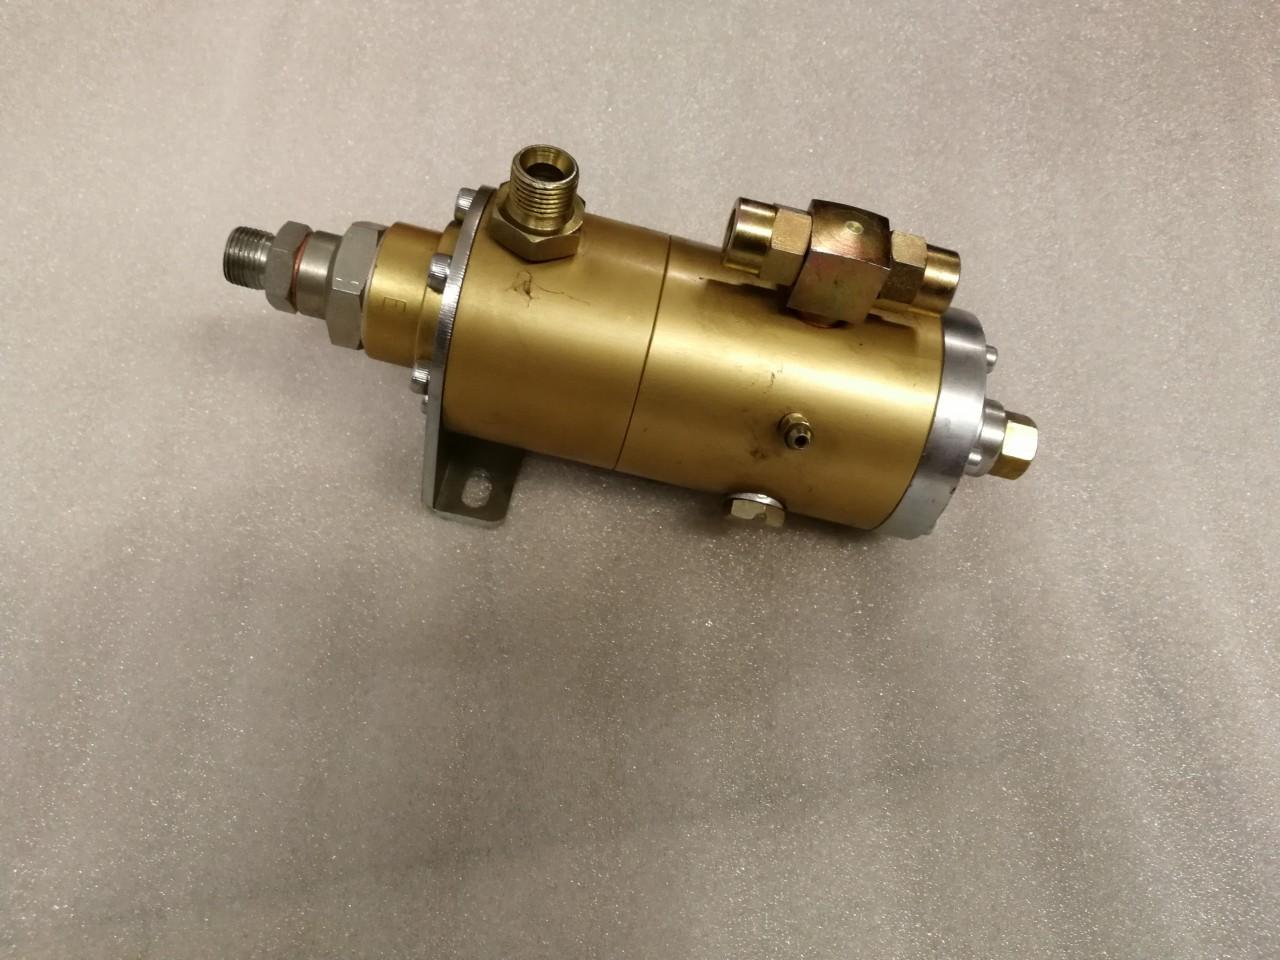 distributore-frenatura-pneumatica-tipo-monotubo-3.jpg